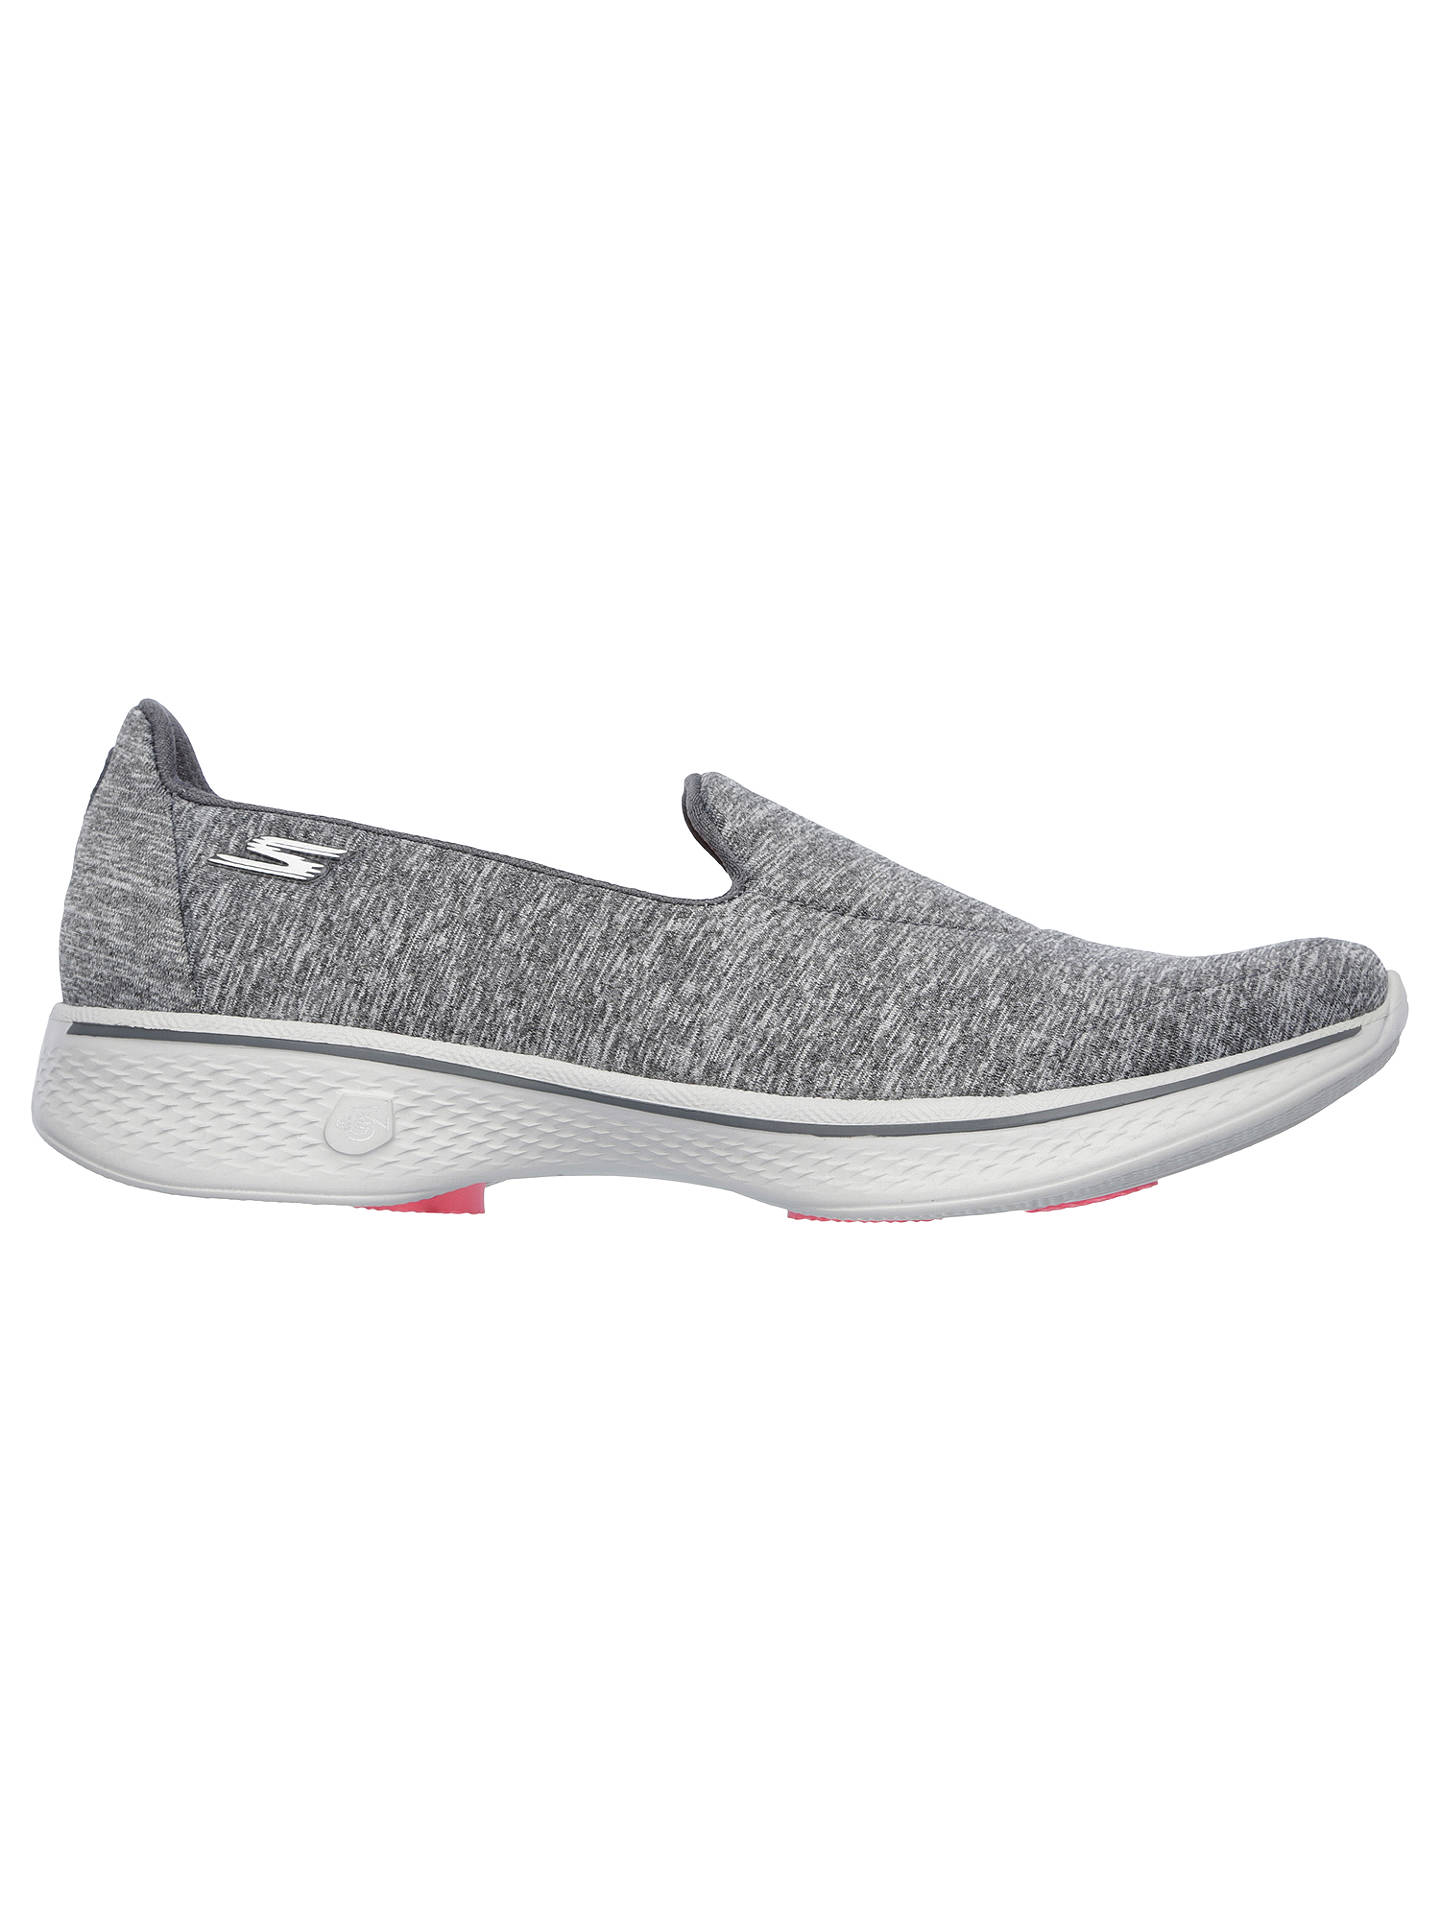 Skechers Ladies go Walk Everyday Grey